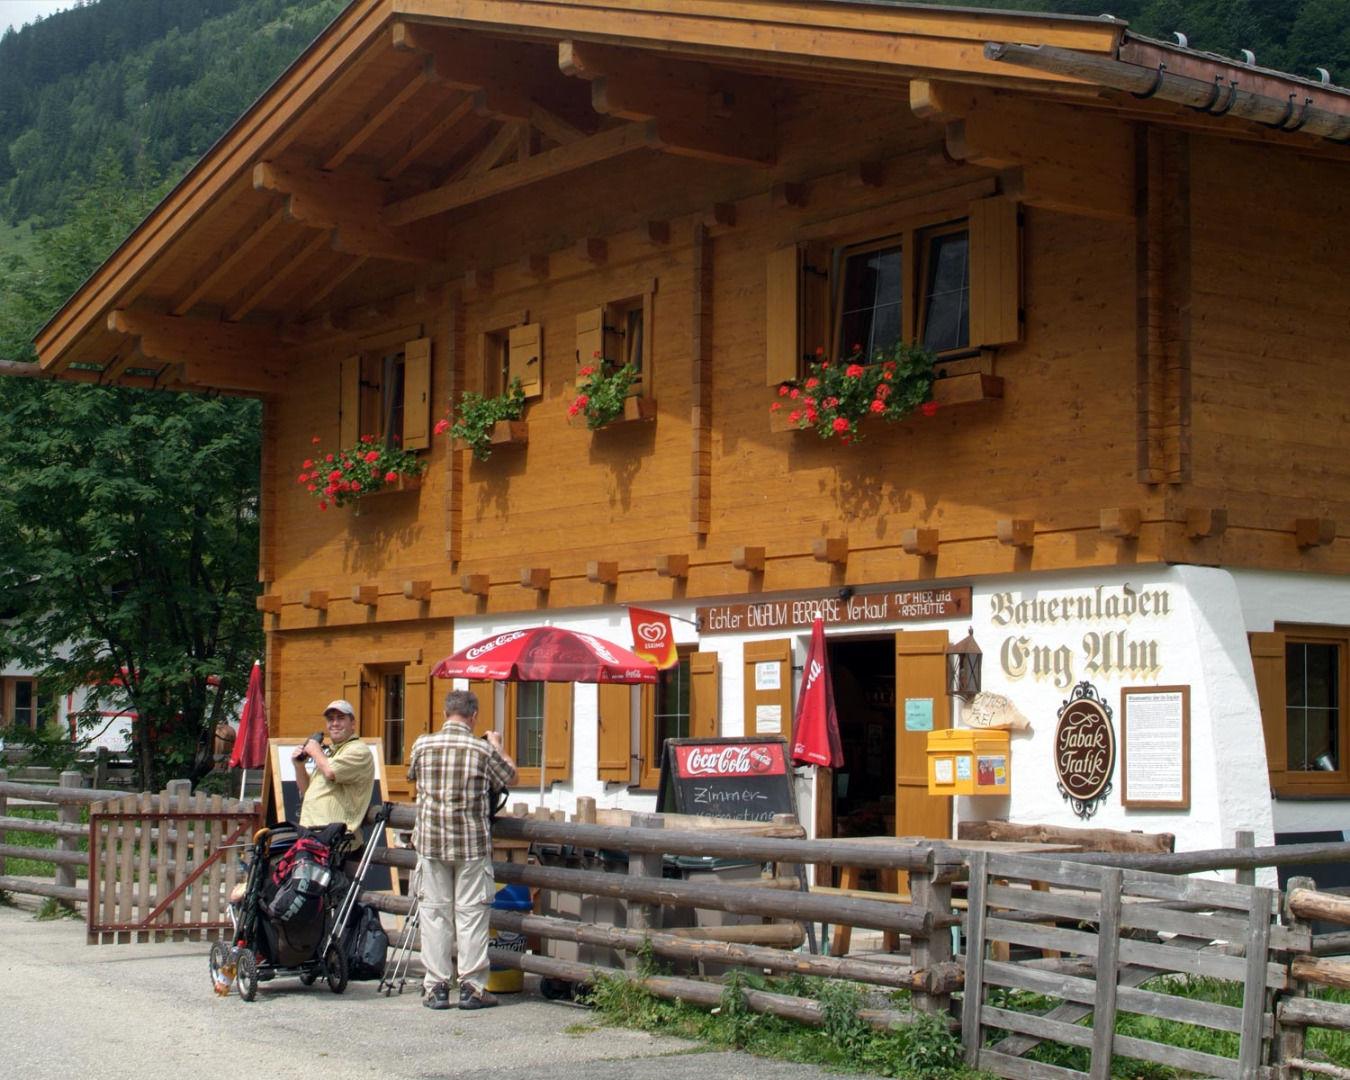 Farm shop Eng Alm